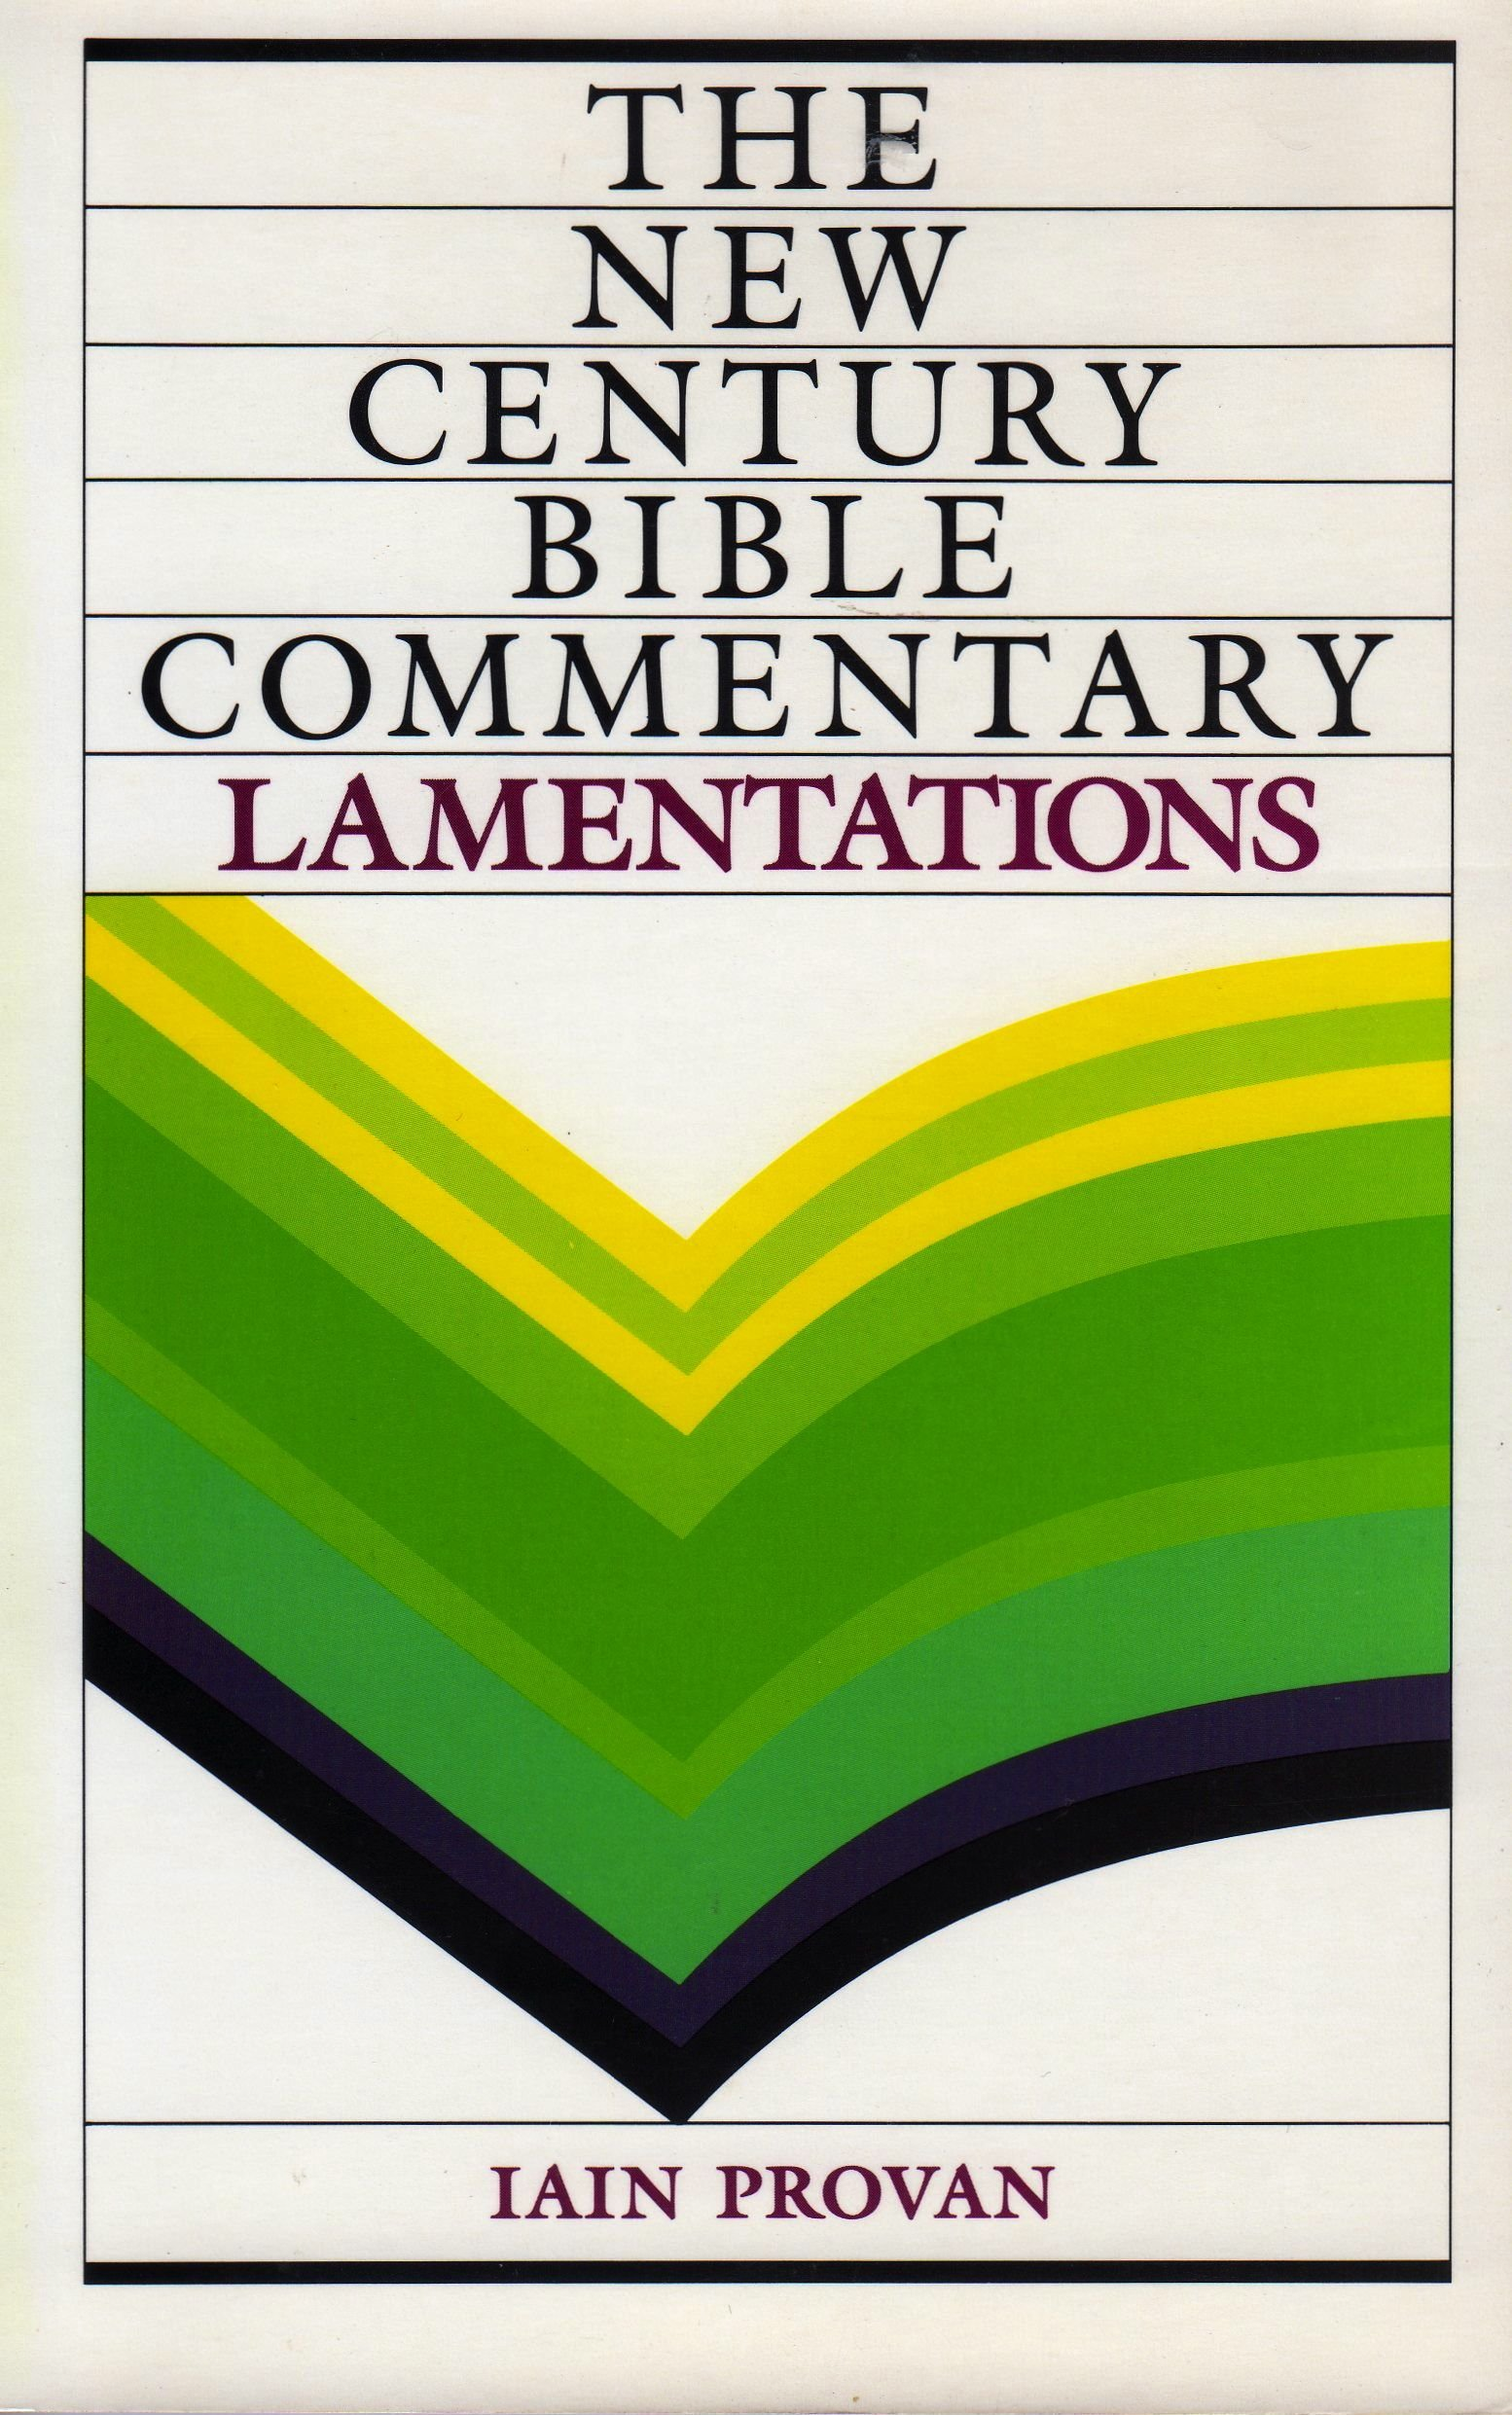 Lamentations new century bible commentary iain ph d provan 9780802805478 amazon com books